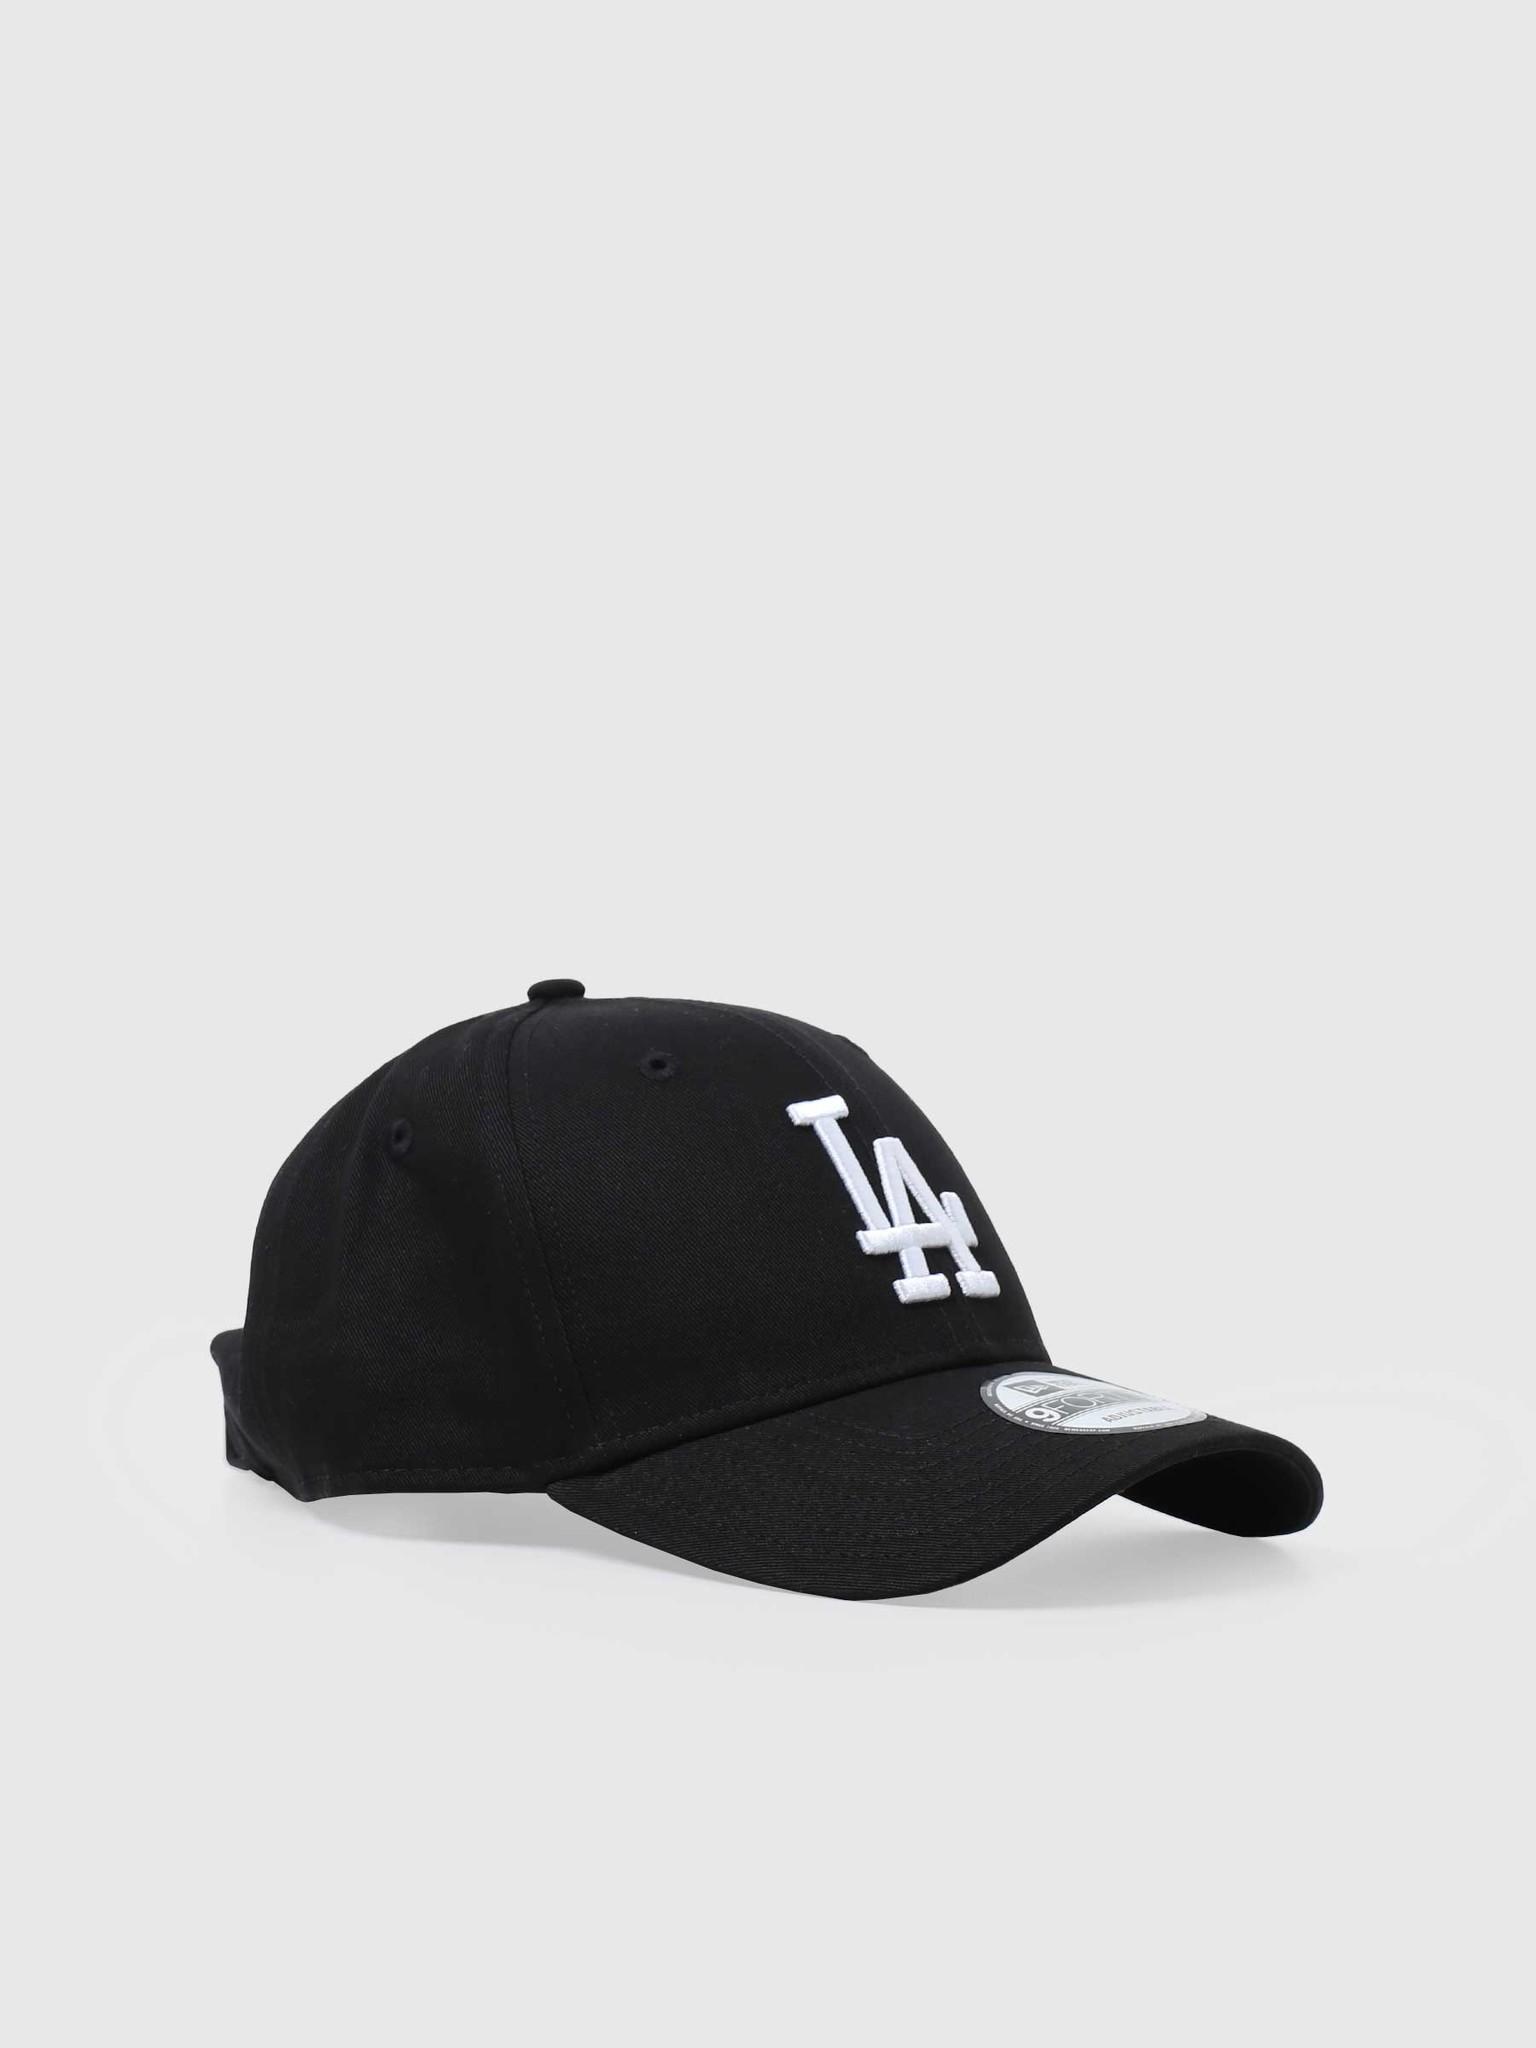 New Era New Era League Essential 9Forty Los Angeles Dodgers 11405493